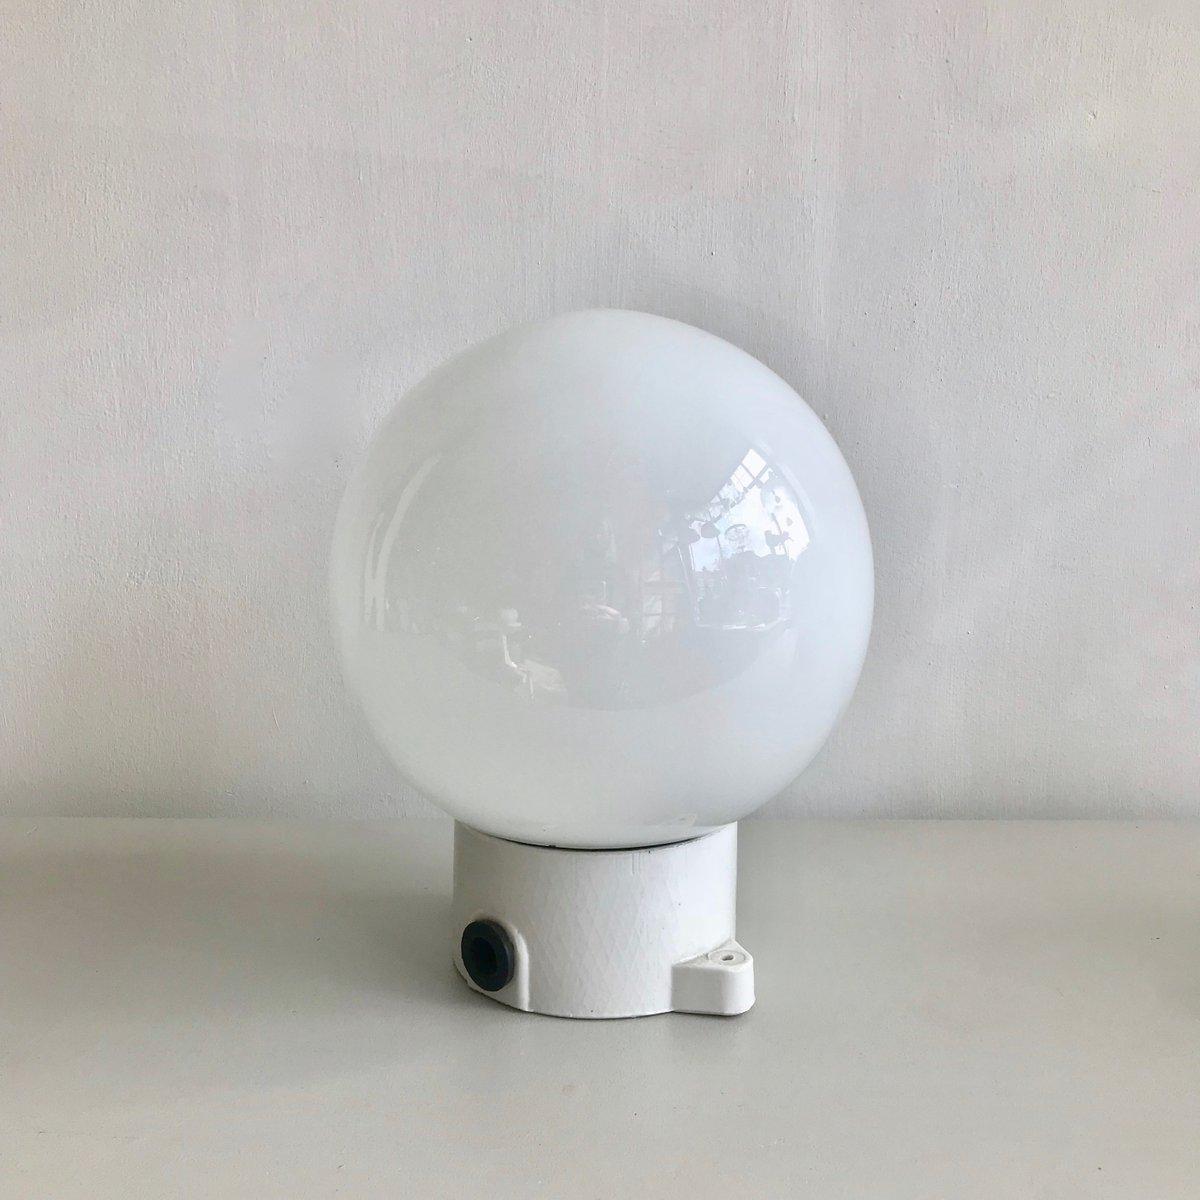 Vintage Ceramic & Opaline Ceiling Lamp or Sconce